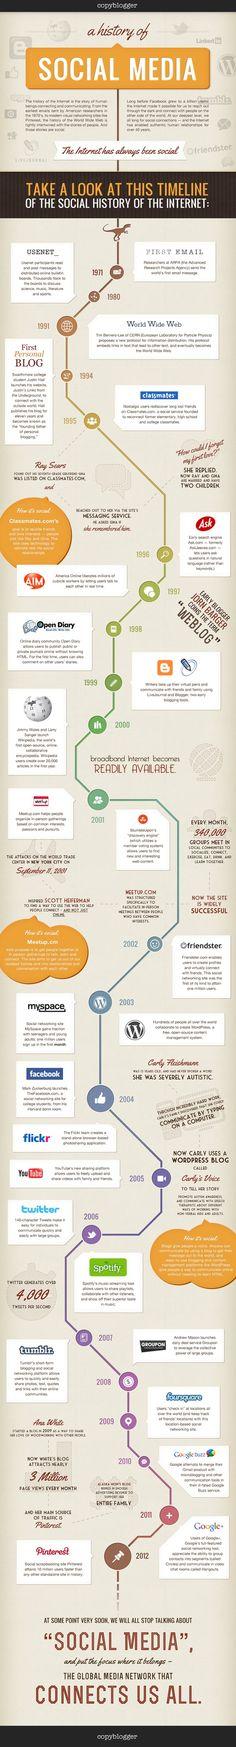 La storia dei social media [infografica] - maestroalberto